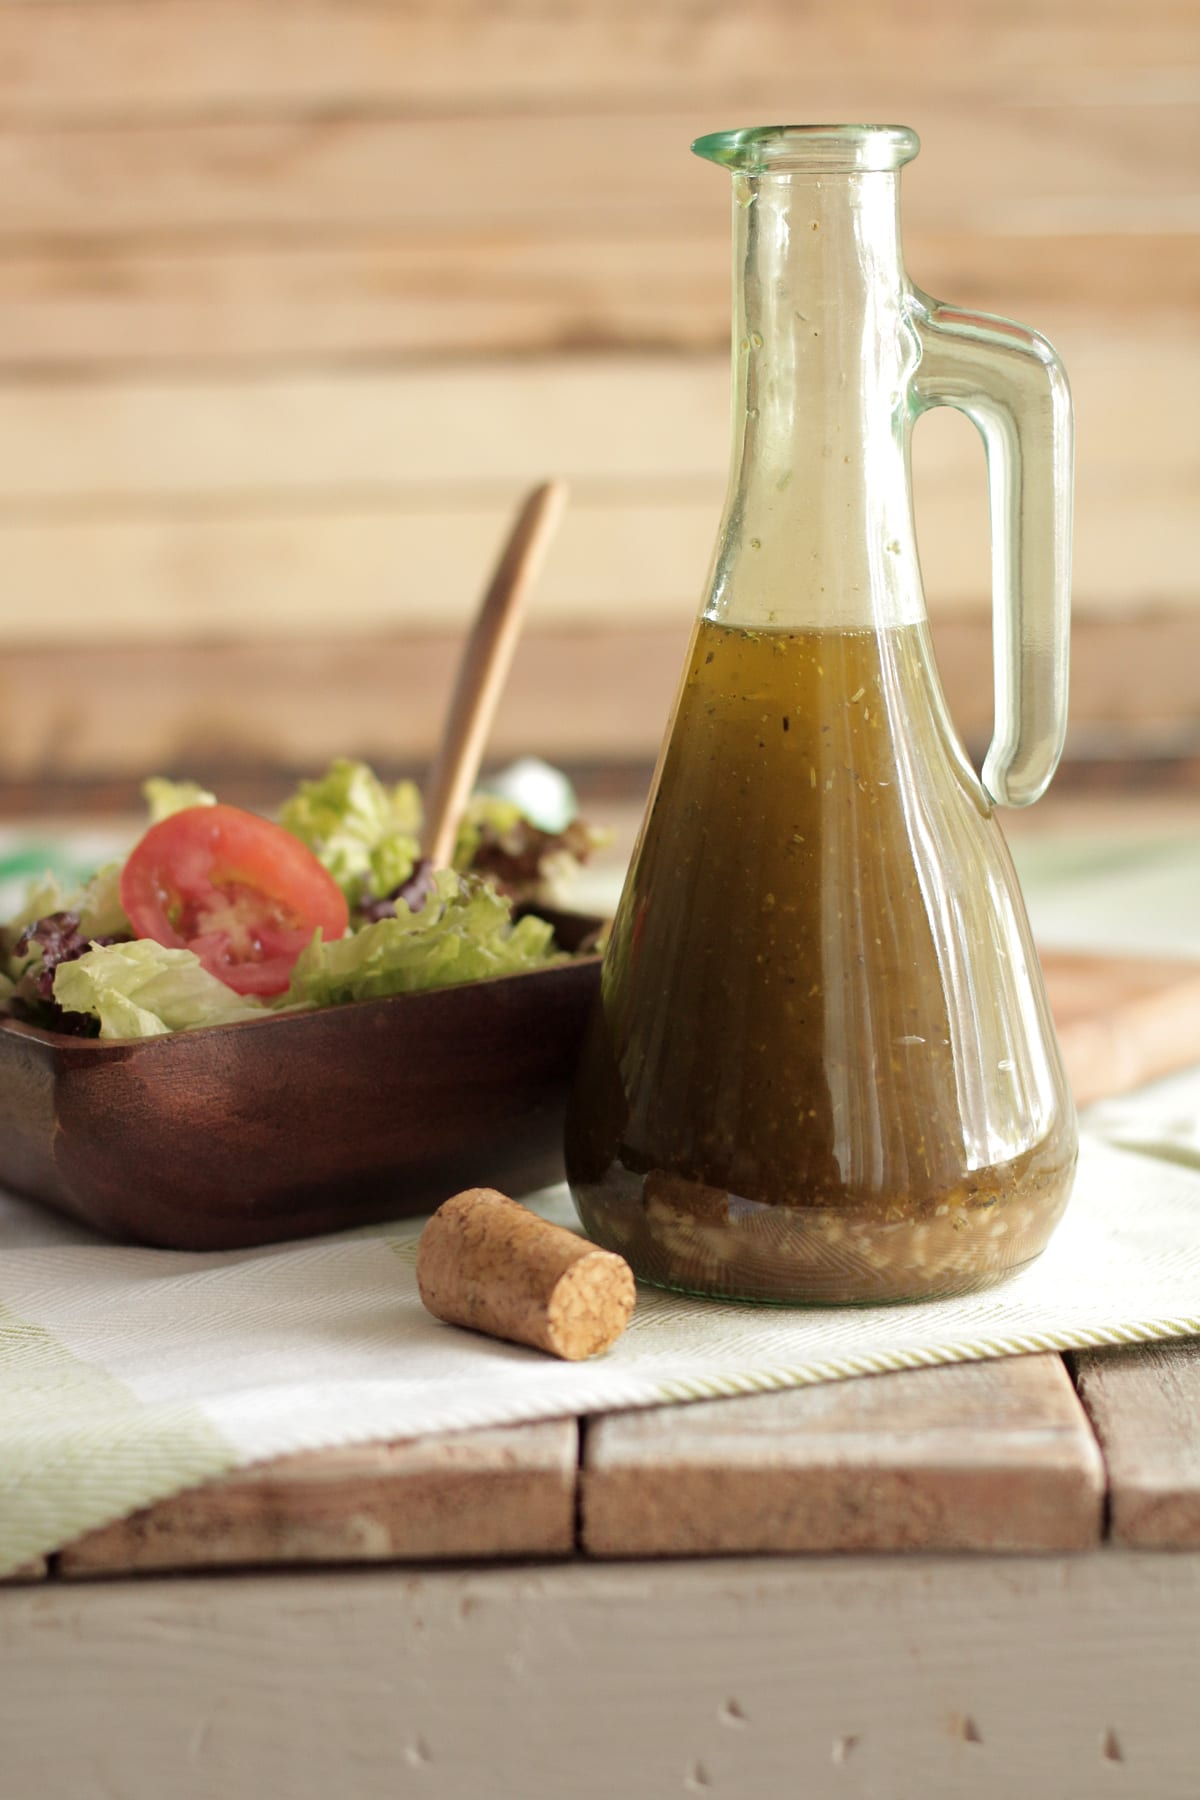 The best homemade vinaigrette salad dressing live simply - Homemade vinegar recipes ...